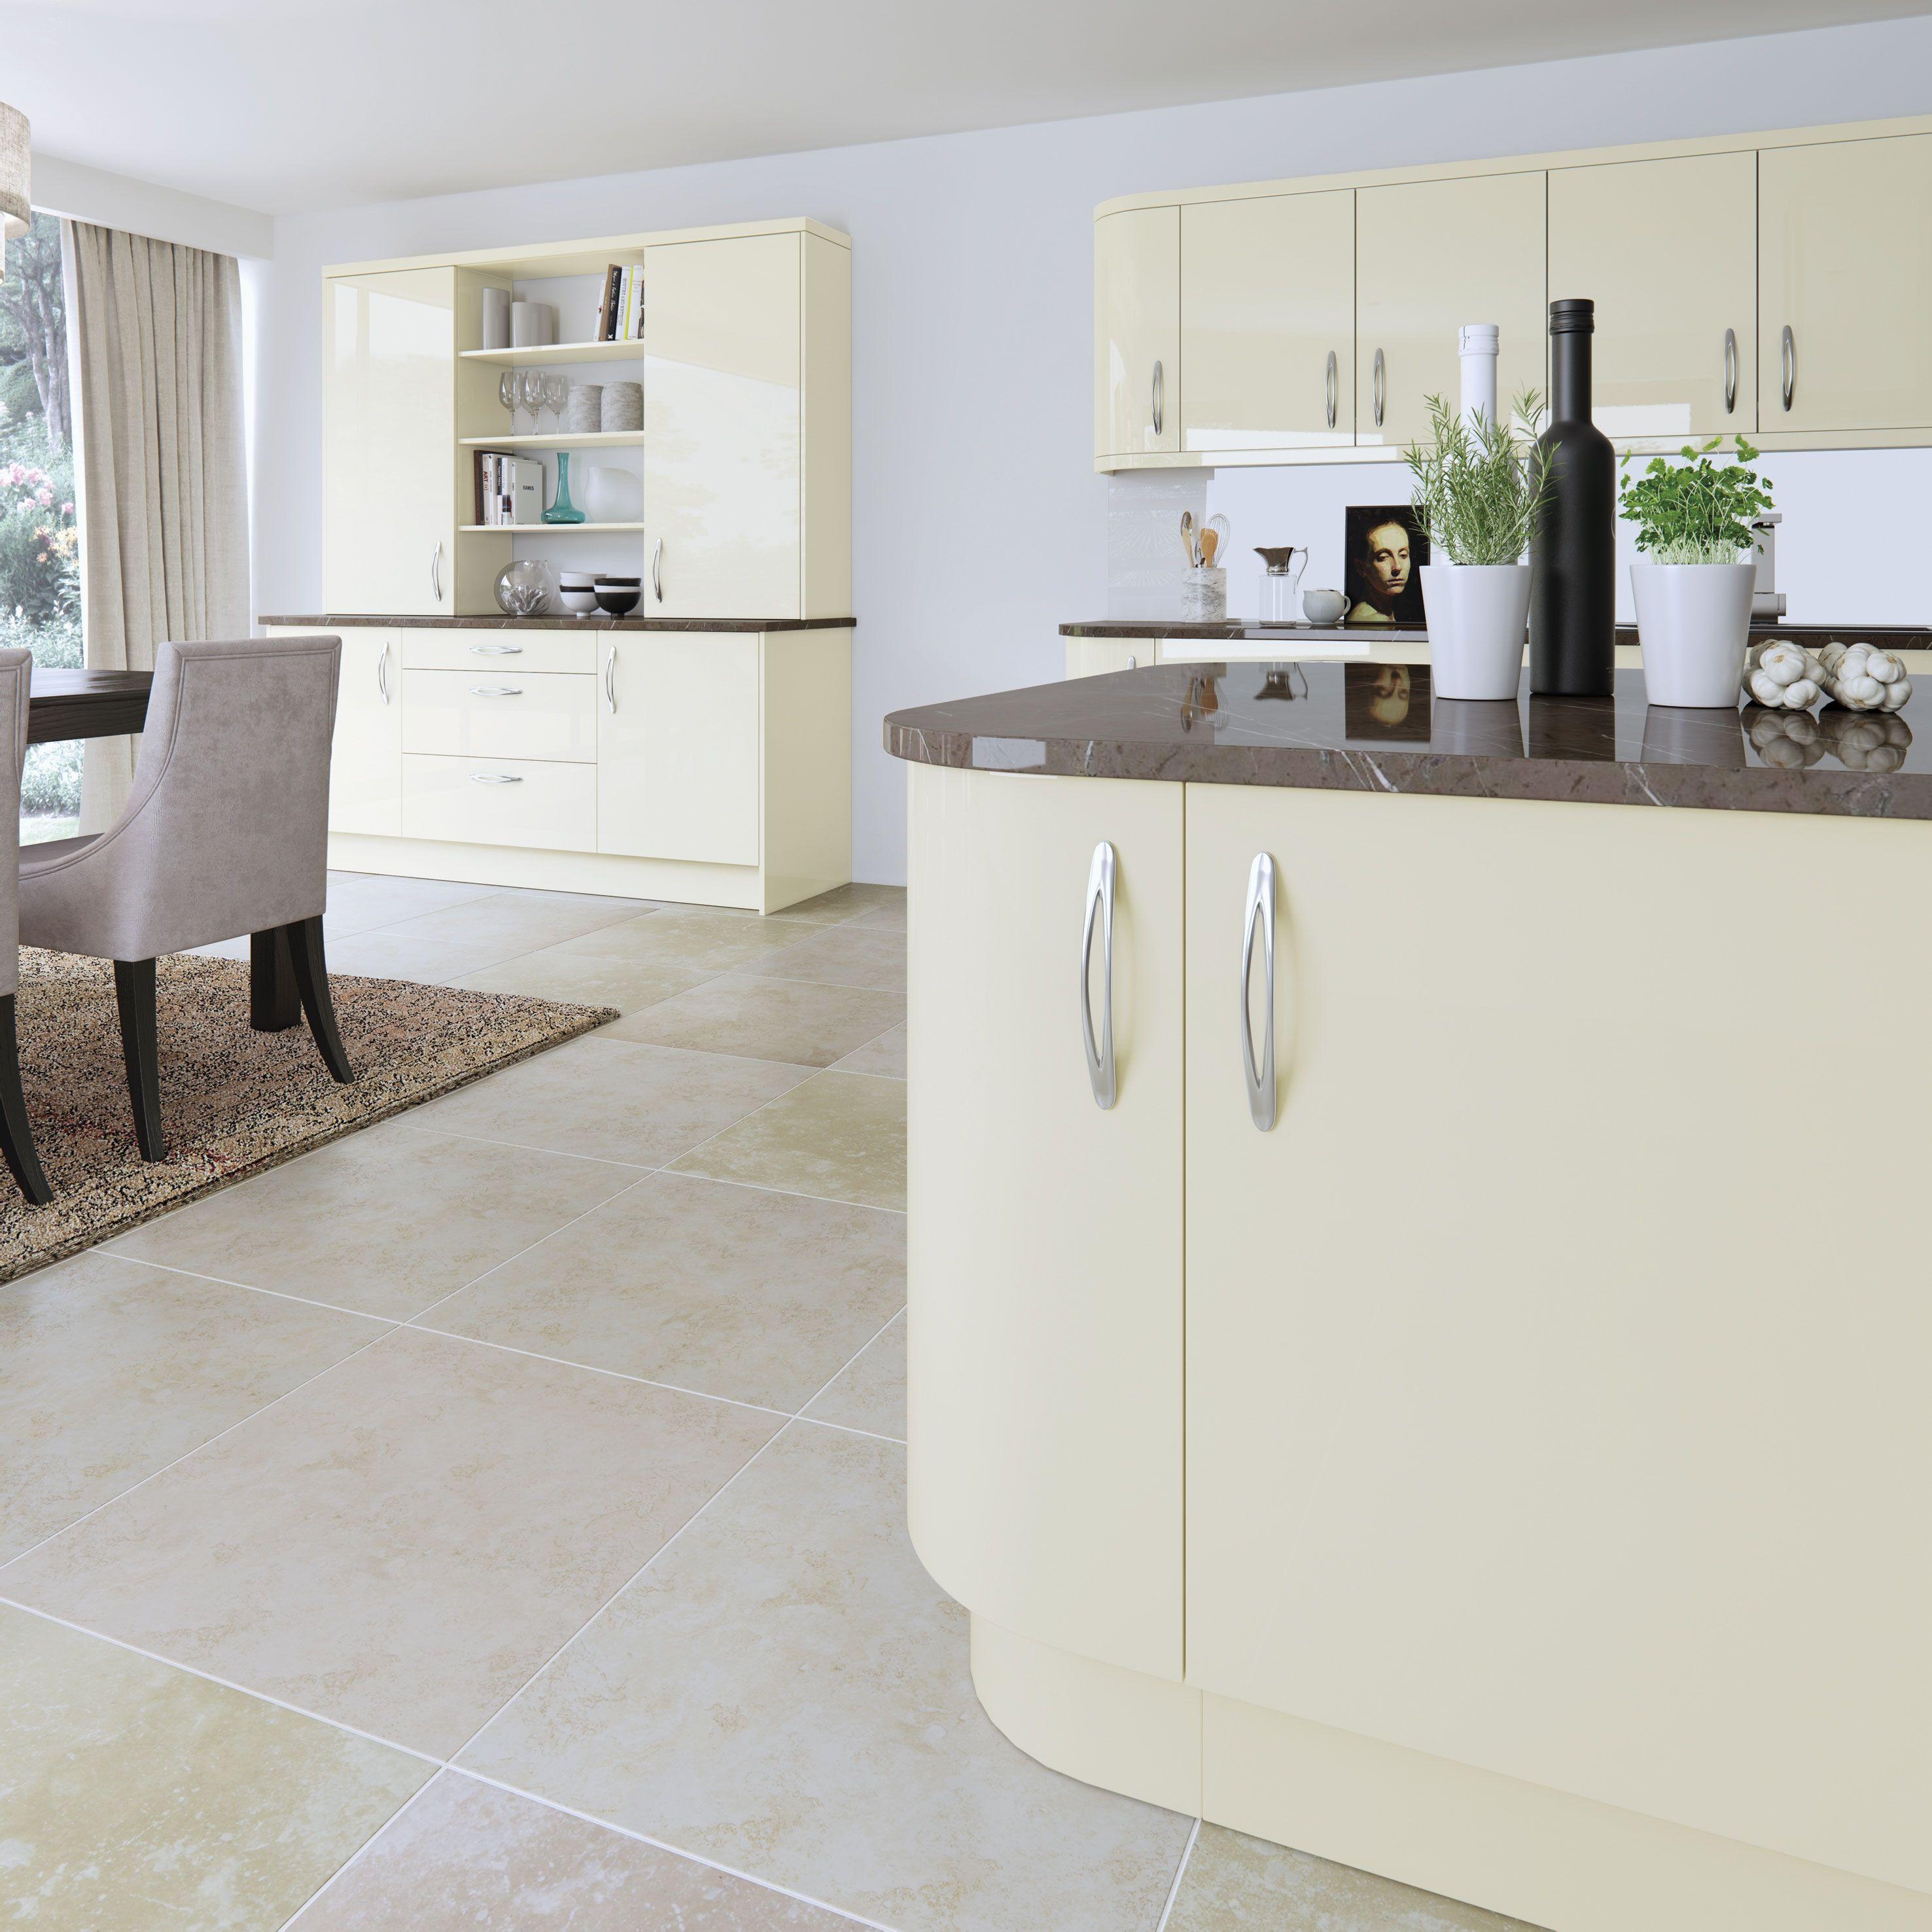 High gloss cream kitchen floor tiles httpweb4top high gloss cream kitchen floor tiles dailygadgetfo Choice Image